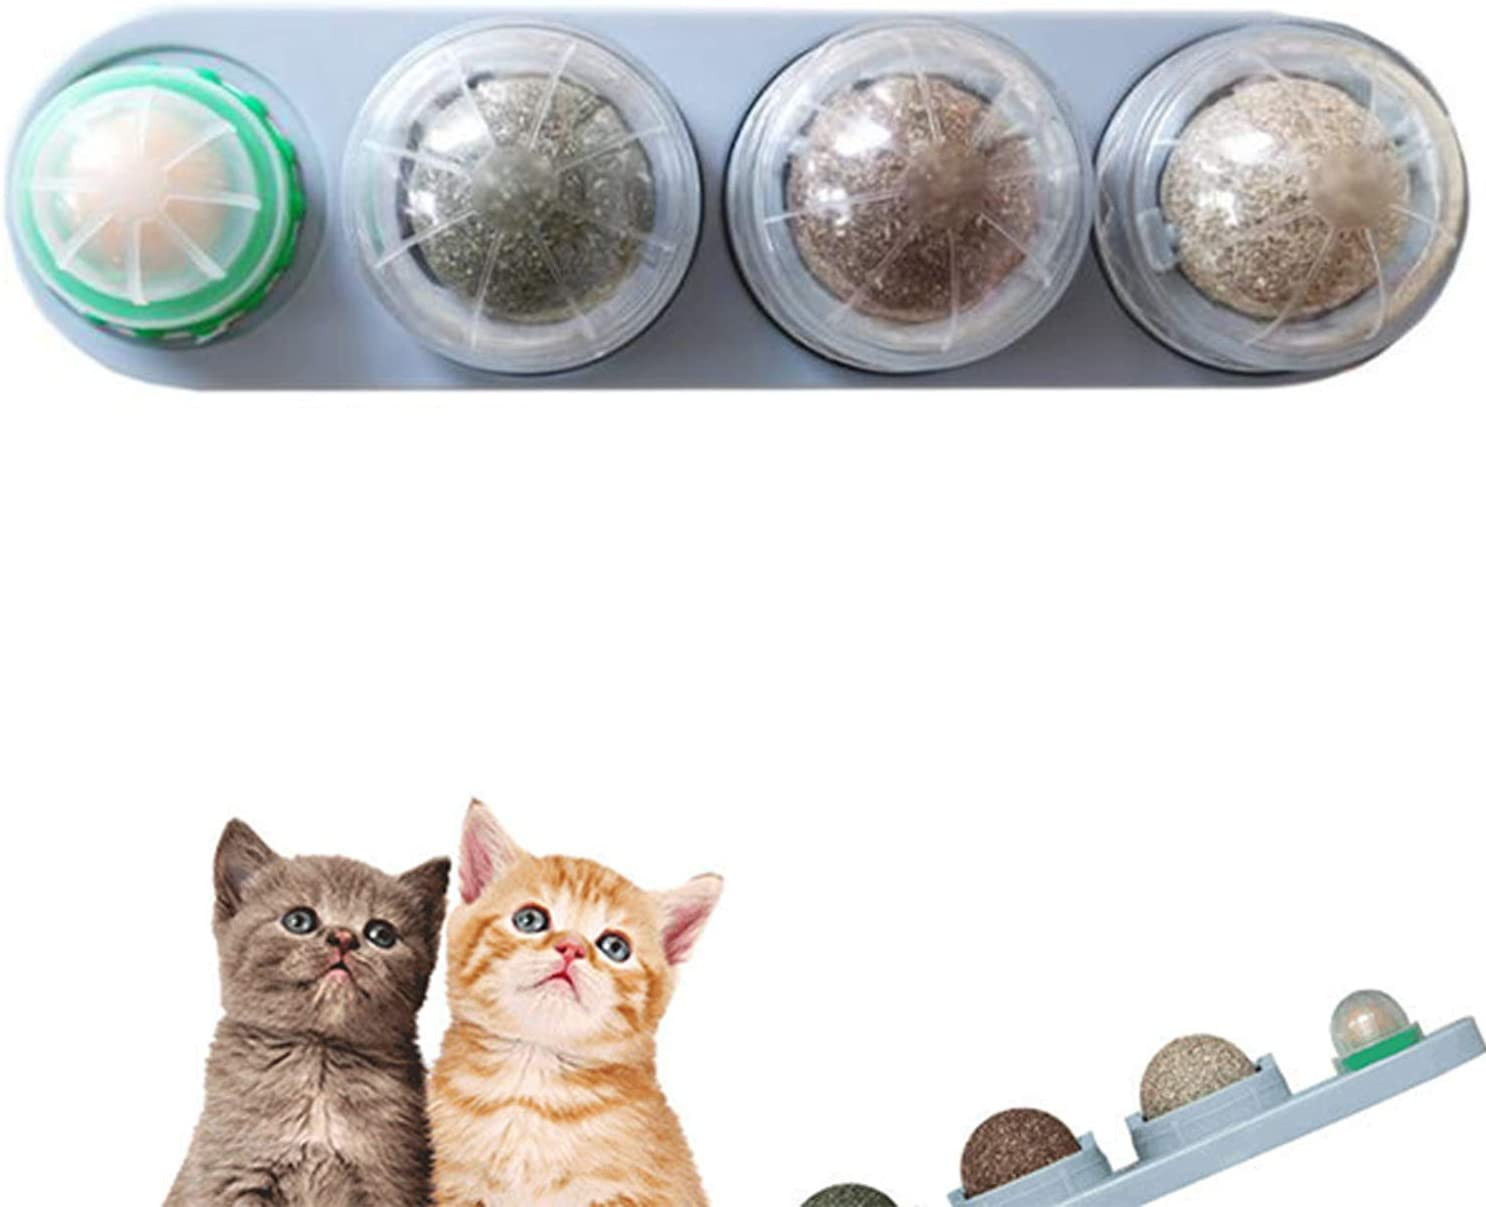 Bolas de Hierba Gatera Natural, Juguete Giratorio para Gato, Juguetes para Gatos 4 en 1 Juguetes de Hierba gatera comestibles autoadhesivos, Juguete esférico de Hierba gatera Segura